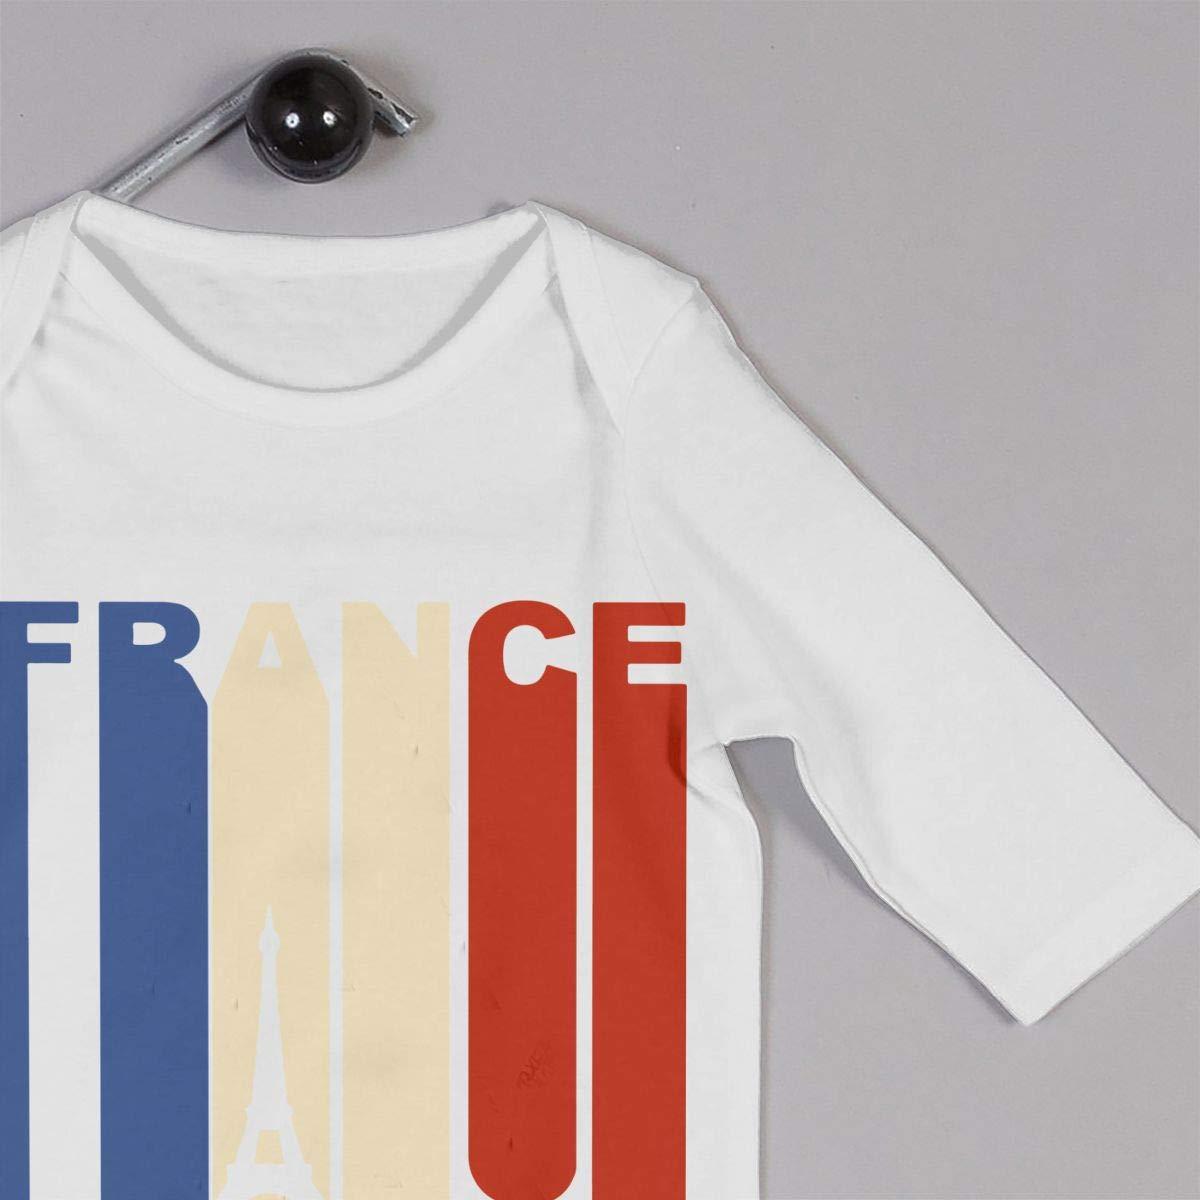 Newborn Baby Boys Girls Cotton Long Sleeve Vintage Retro 1970s Style Eiffel Tower France Flag Climb Romper Romper Clothes